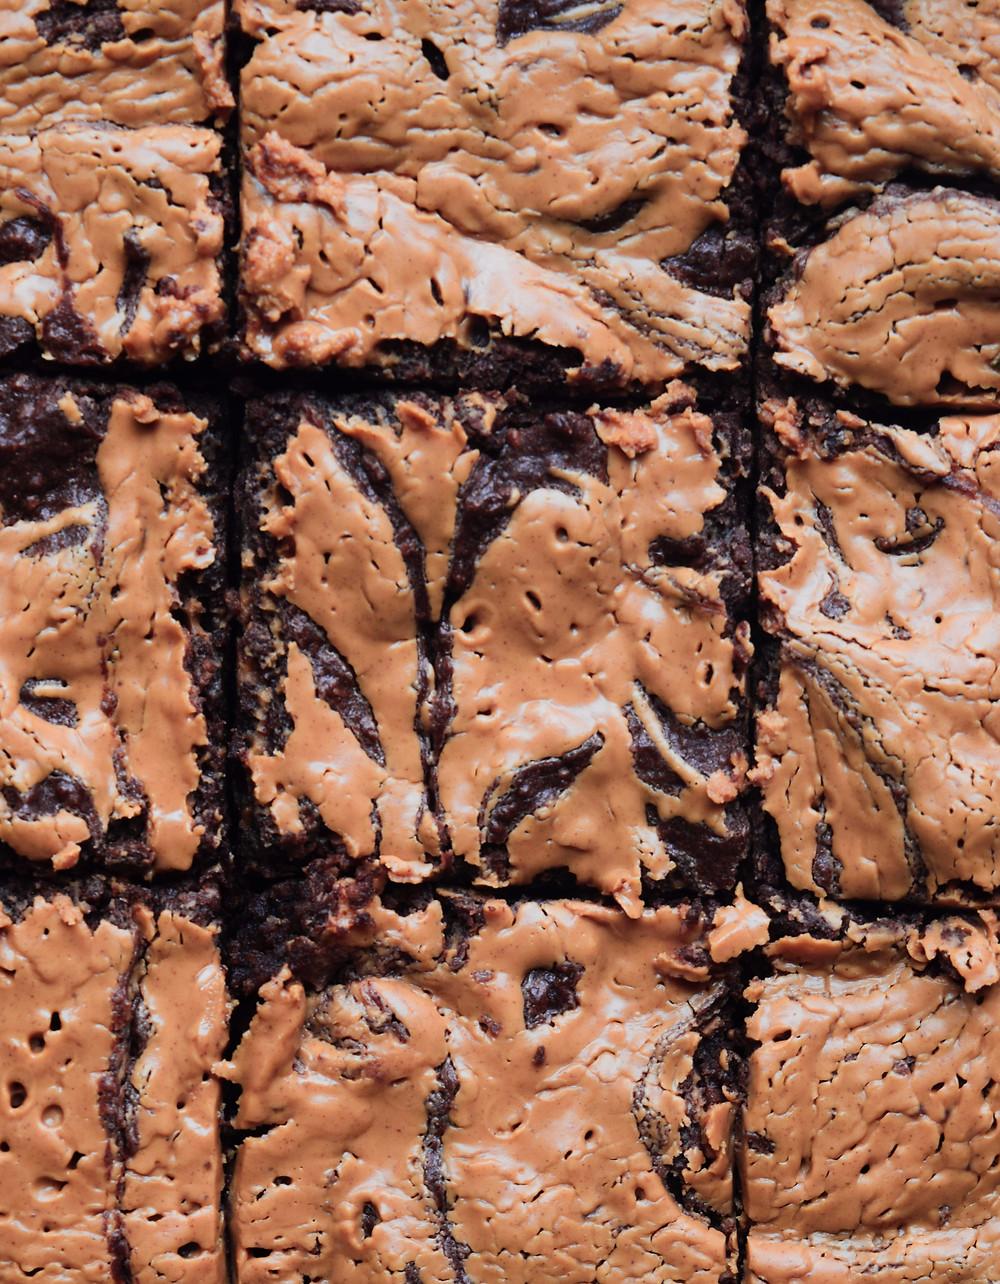 Vegan Peanut Butter Brownies (Gluten-Free)